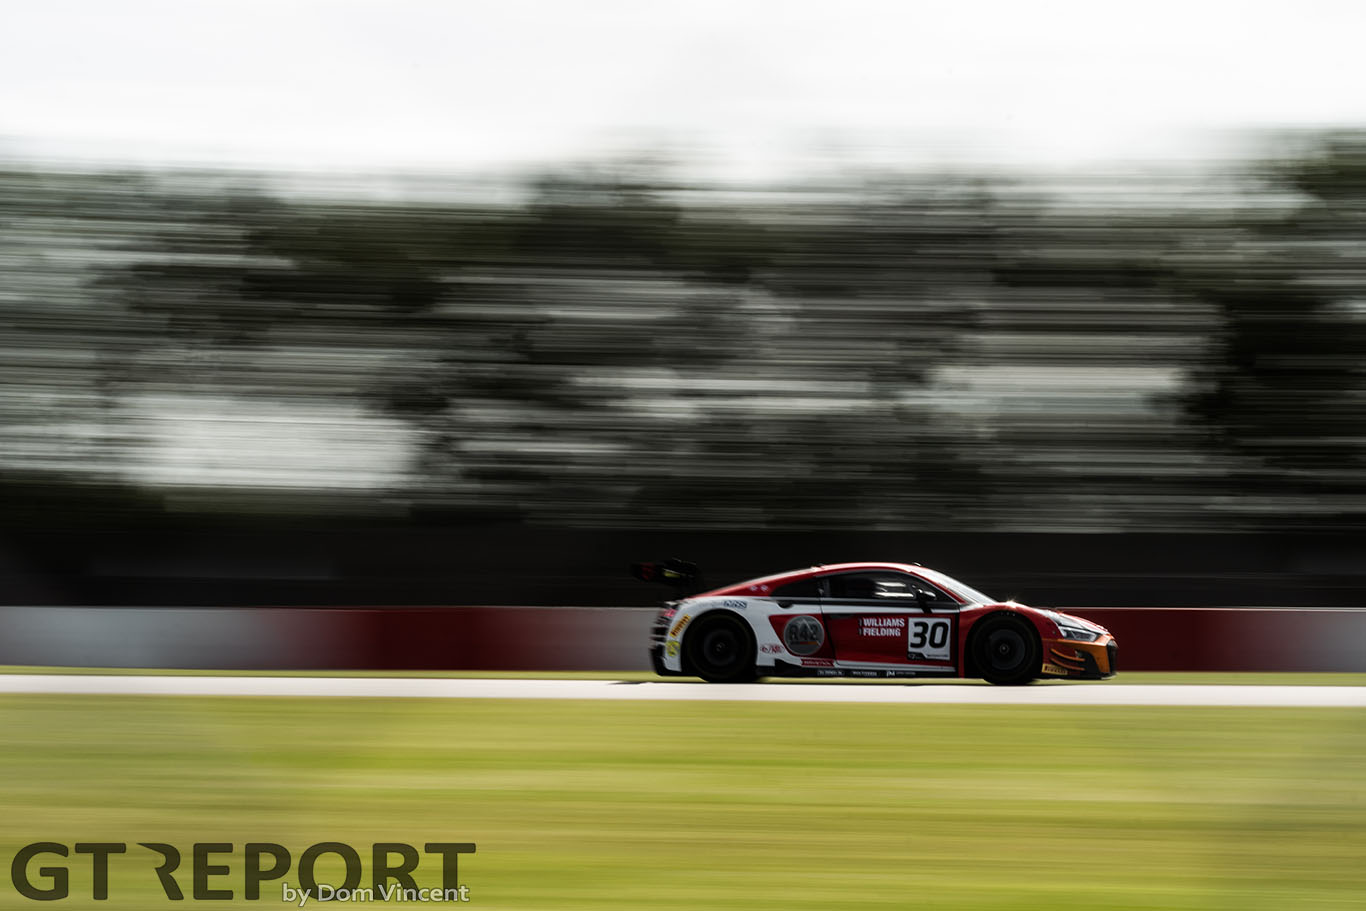 British GT Donington Park 2 live stream